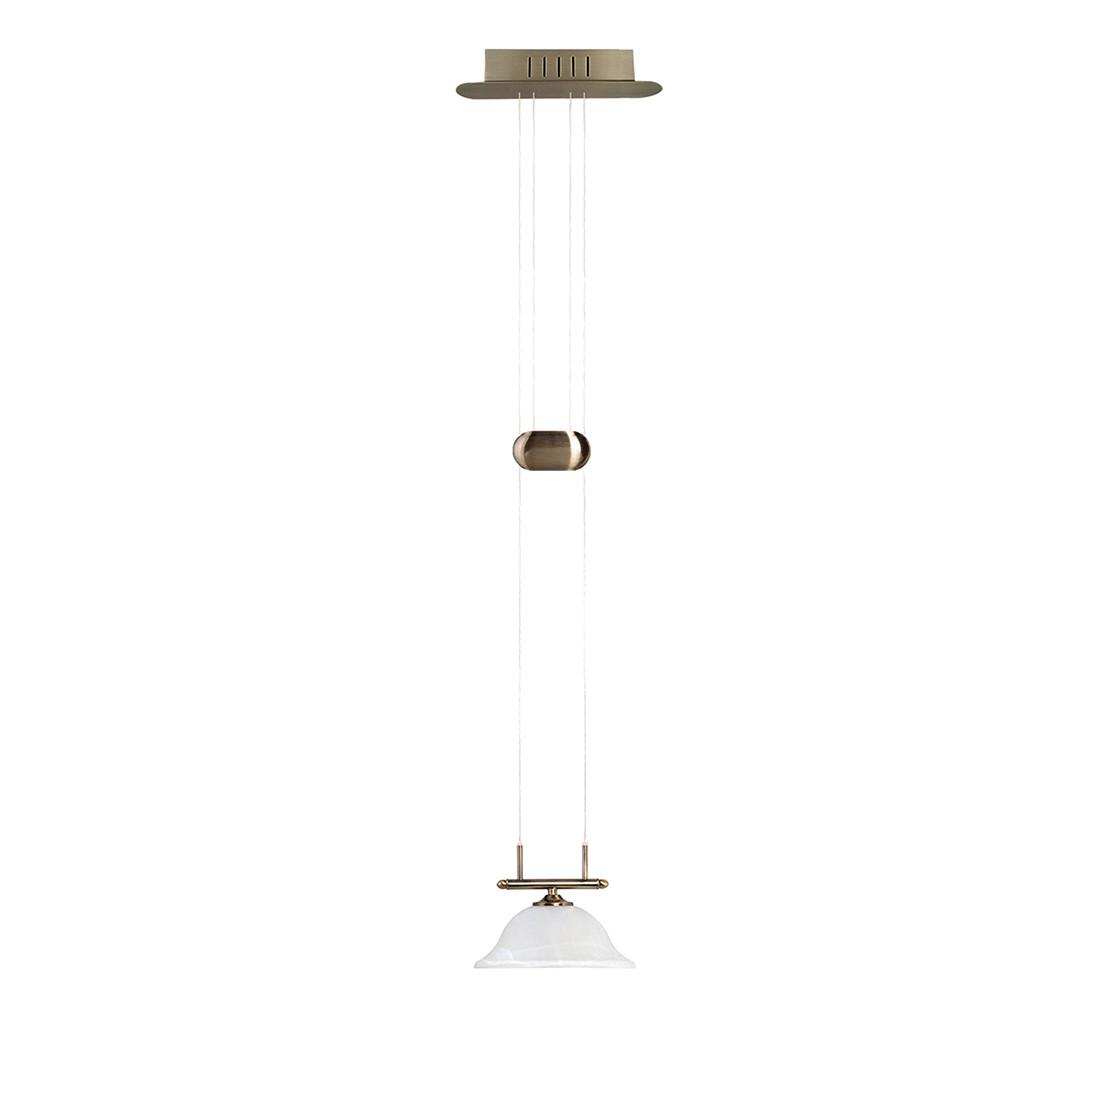 energie  A+, LED-hanglamp Alessia - oud messing/metaal 1 lichtbron, Sorpetaler